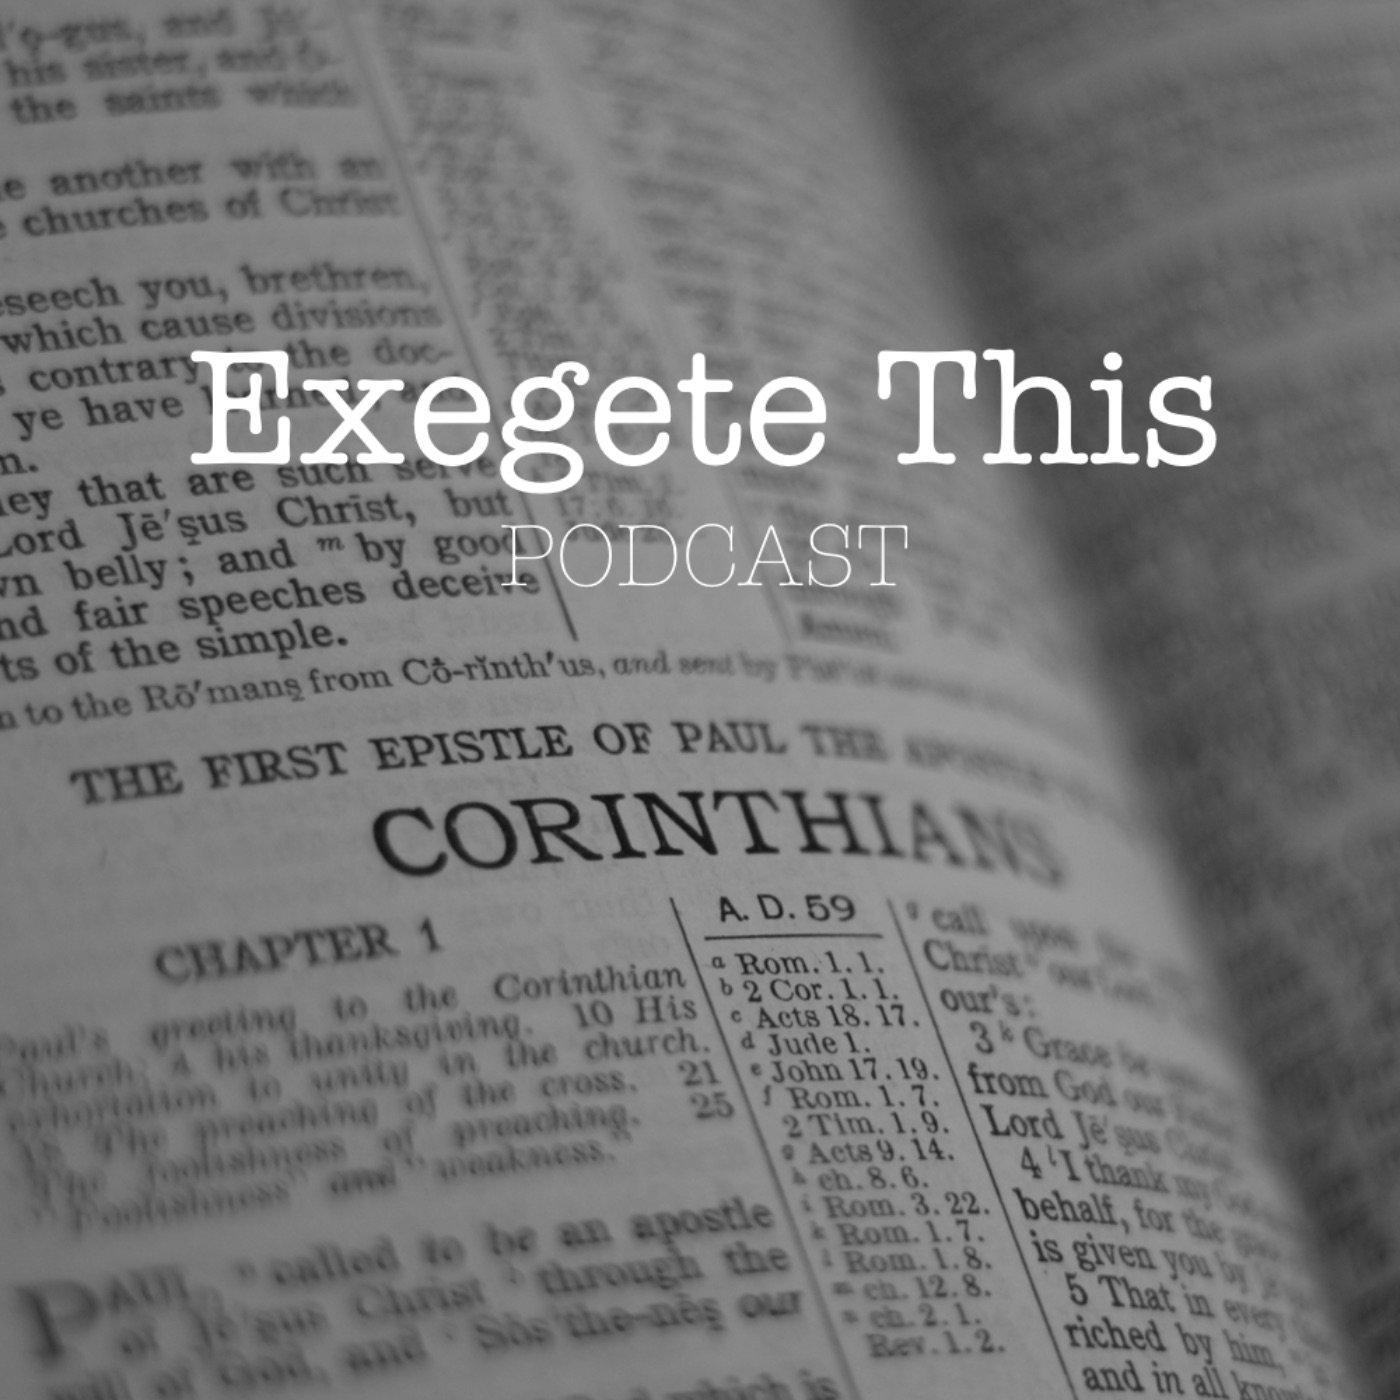 1 Corinthians 4:14-5:13